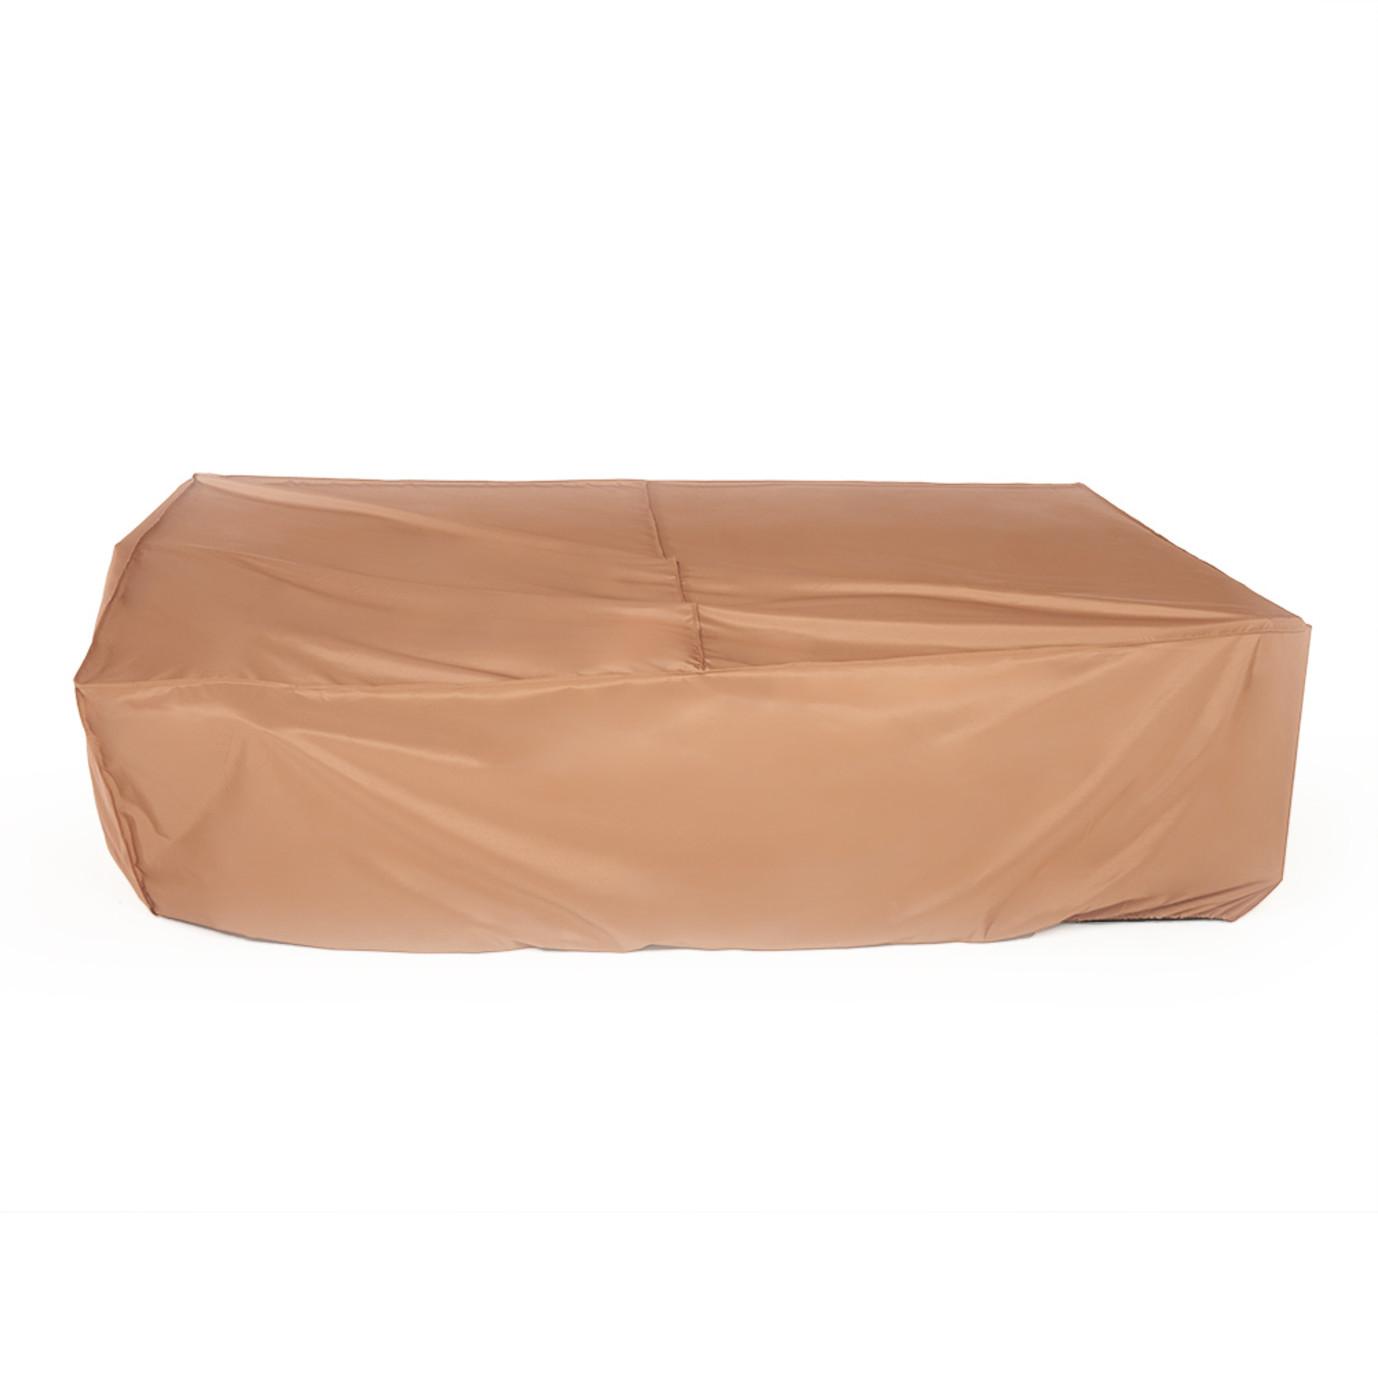 Portofino™ 4pc Moda Furniture Cover Set